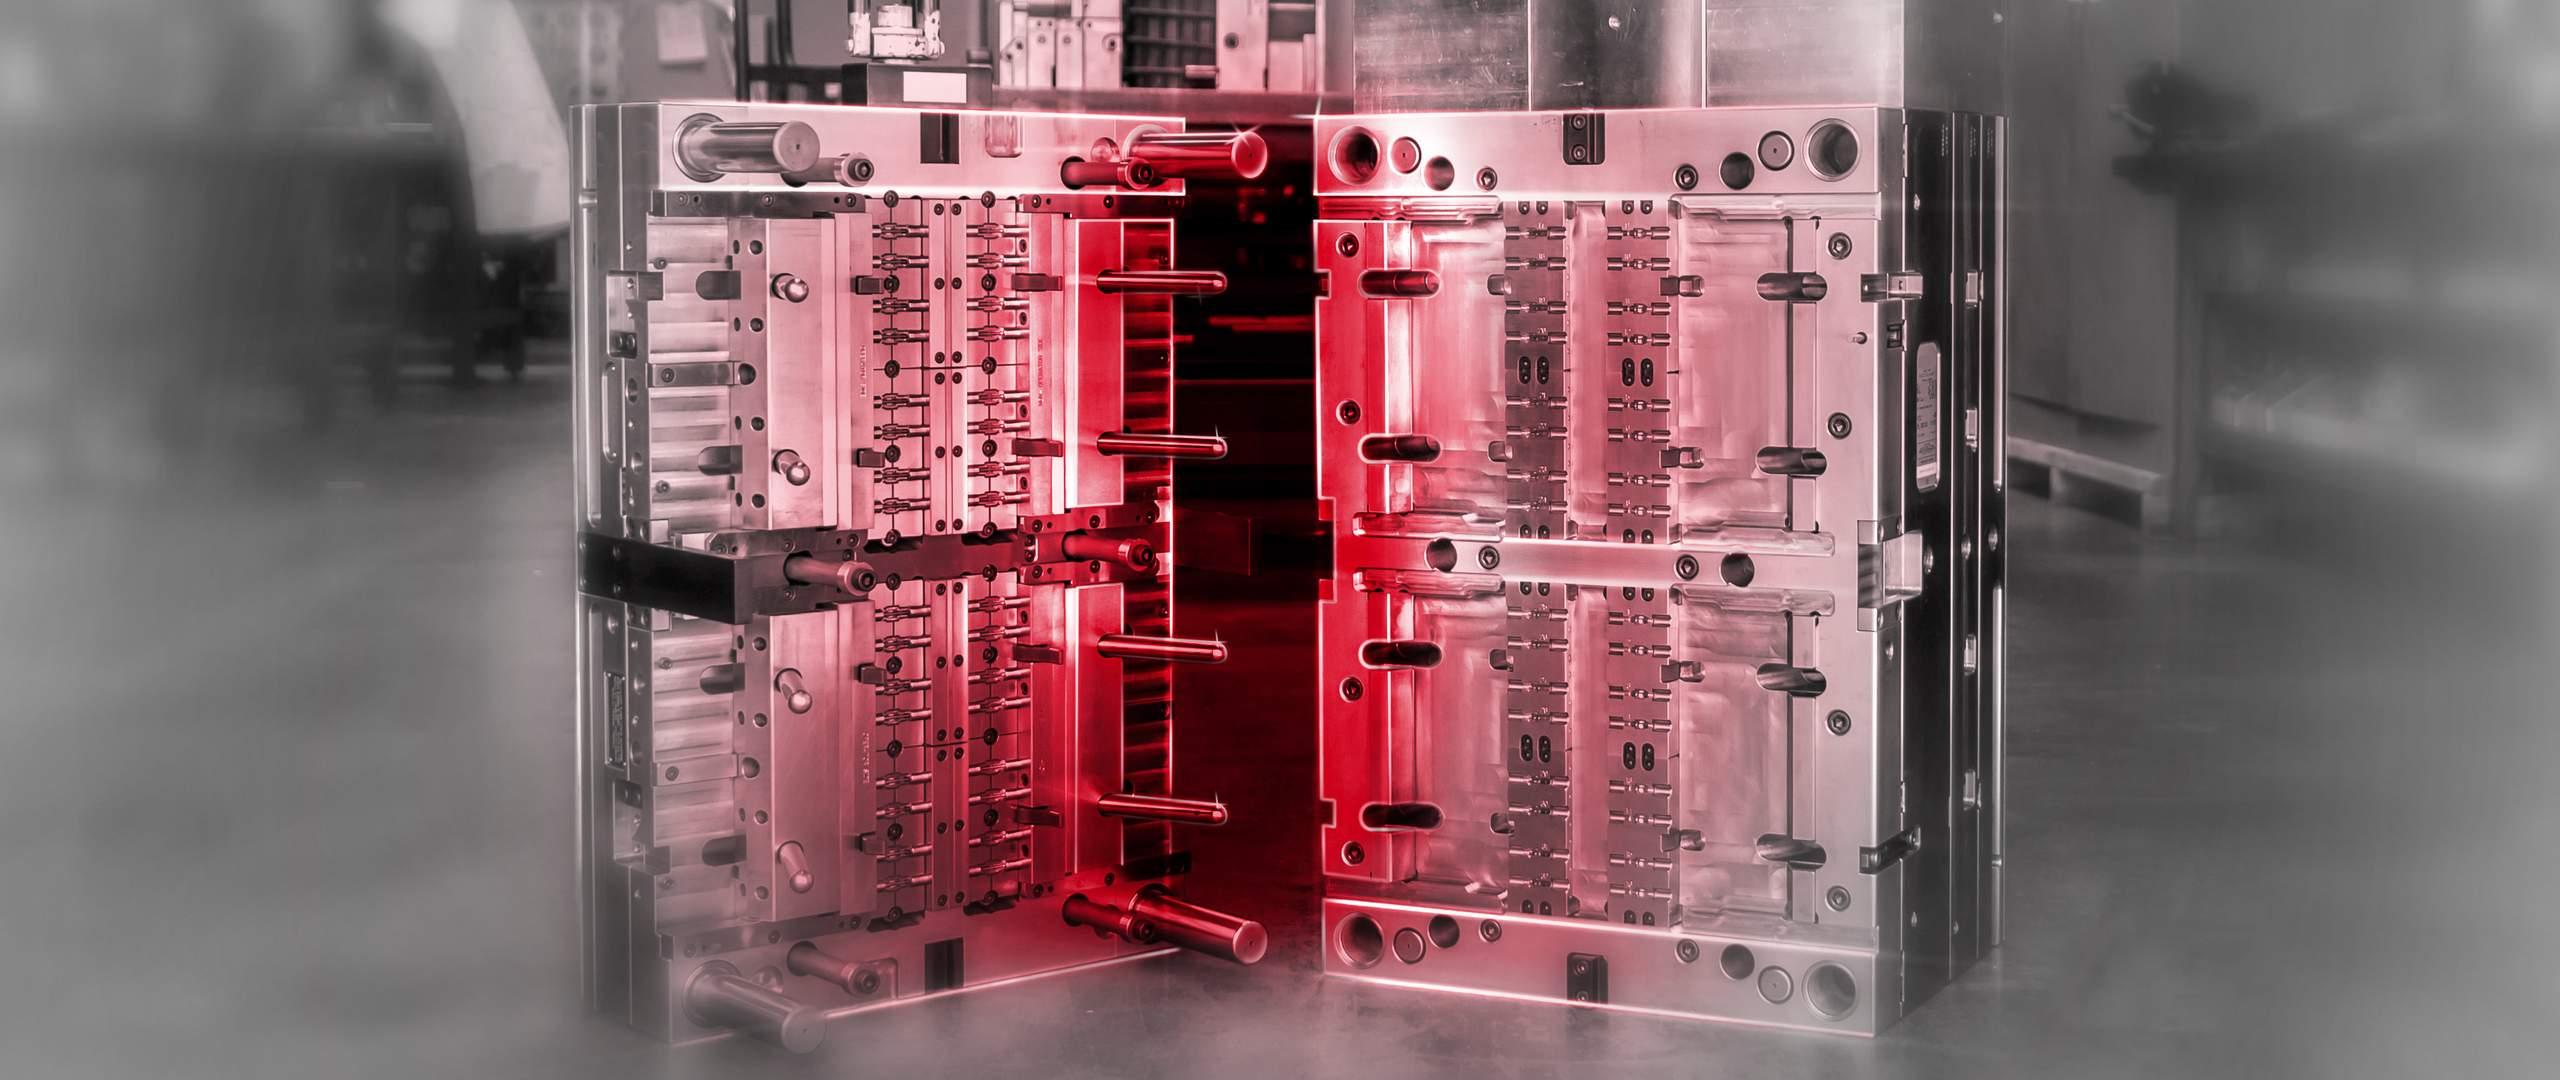 NX Mold Design | Janus Engineering